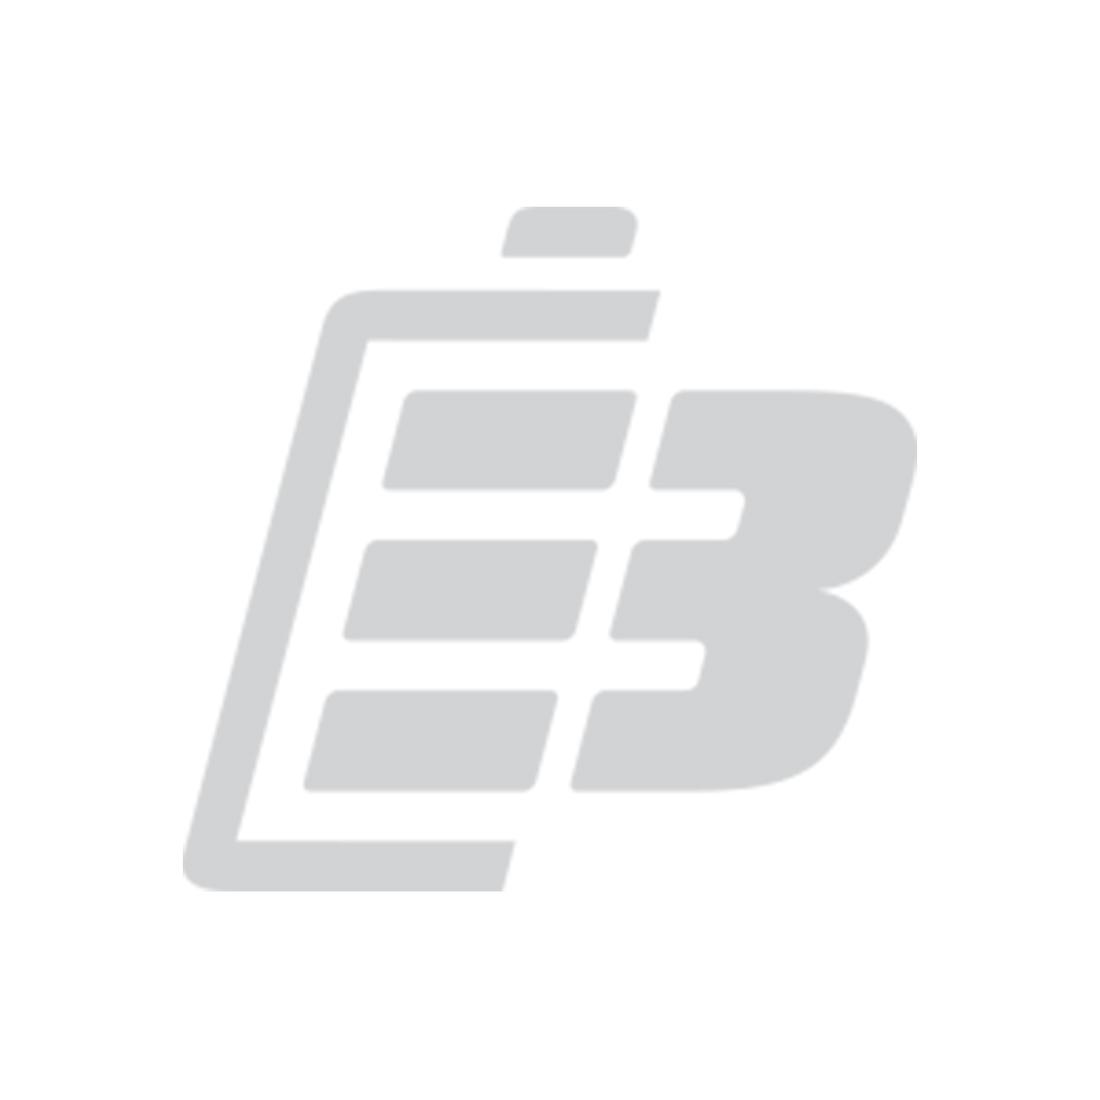 Efest IMR 18650 battery 3000mAh 35A 1